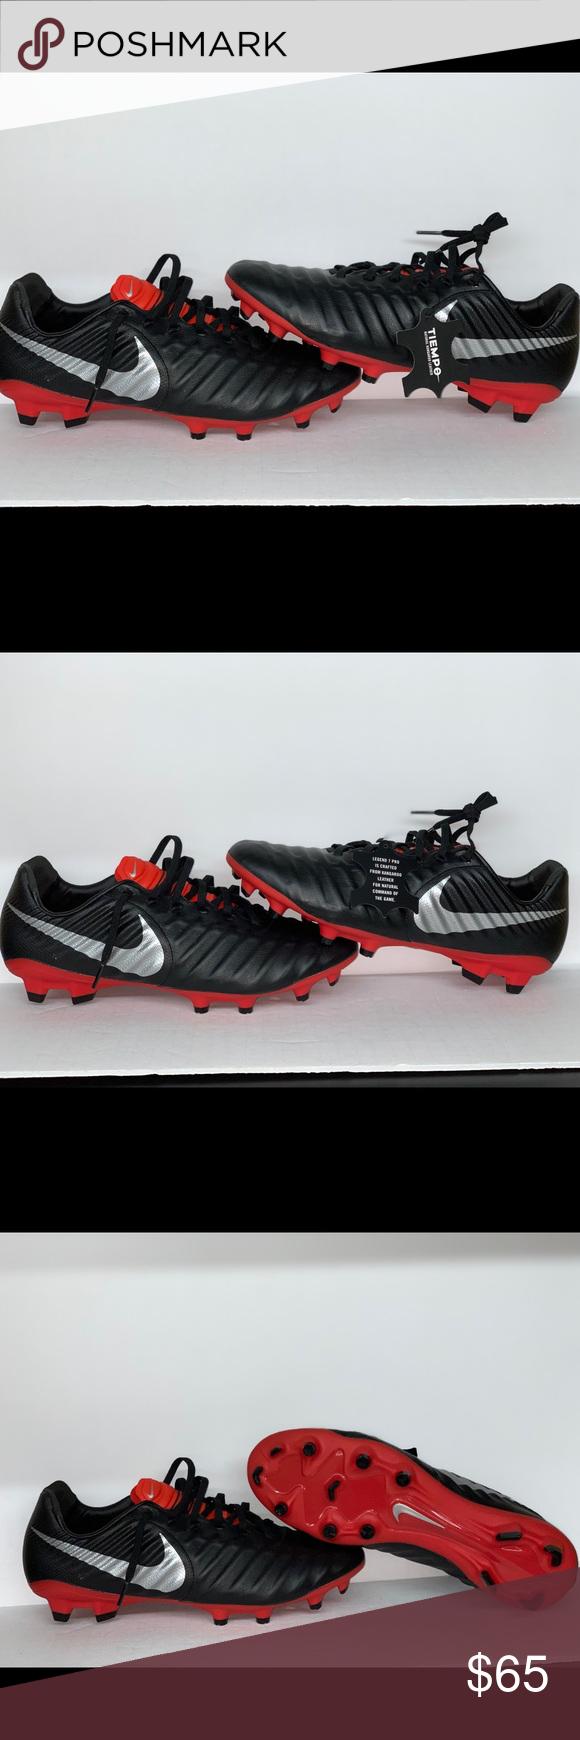 Nike Tiempo Legend 7 Pro Fg Soccer Cleats Nwt Soccer Cleats Cleats Nike